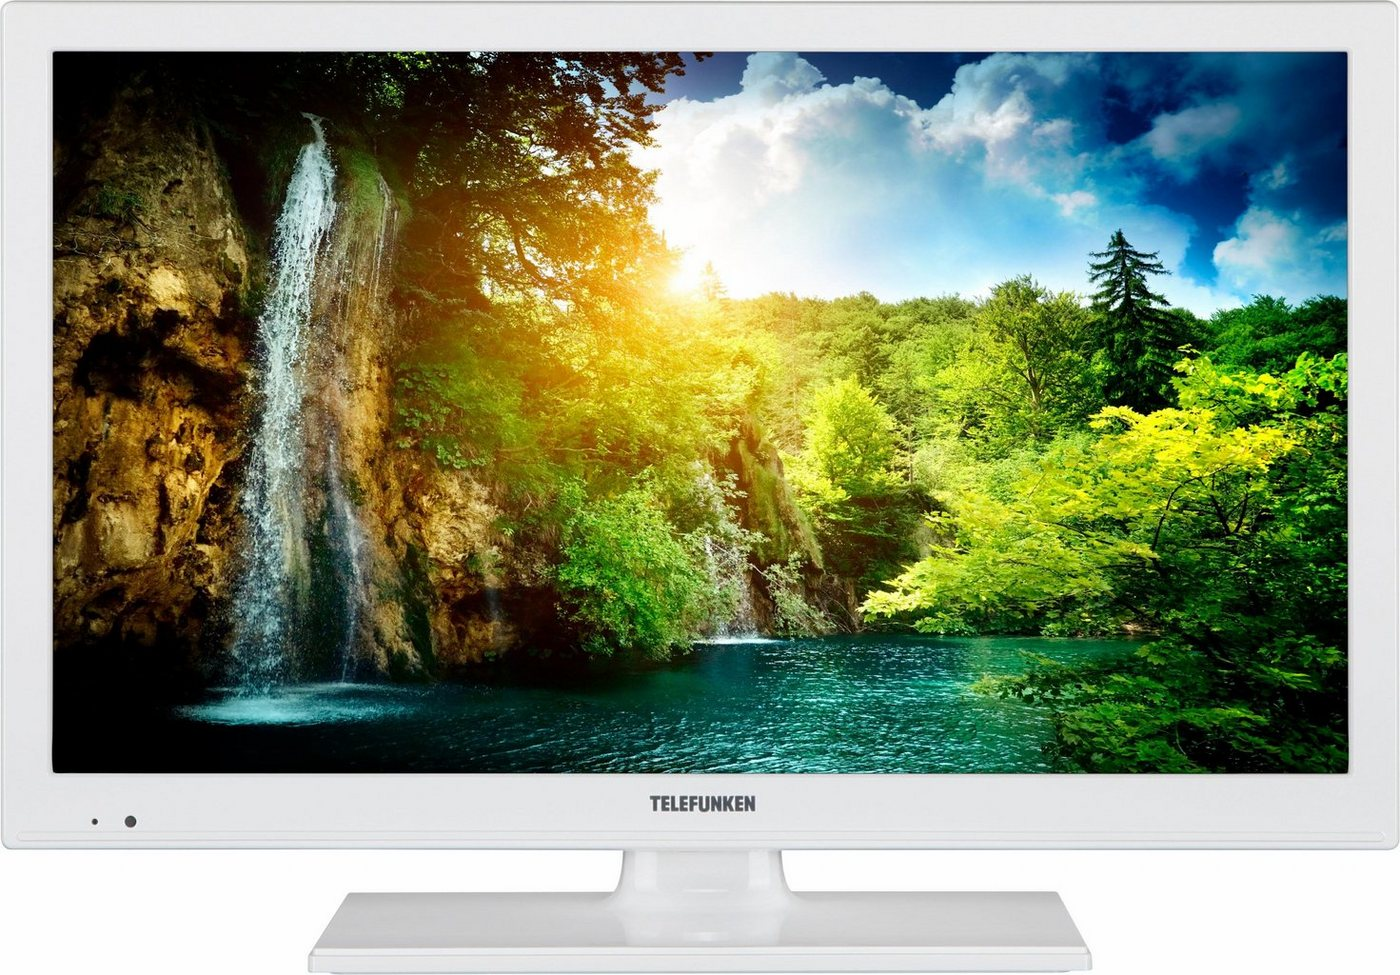 Telefunken L22F472M4 LED-Fernseher (56 cm/22 Zoll, Full HD) - Telefunken